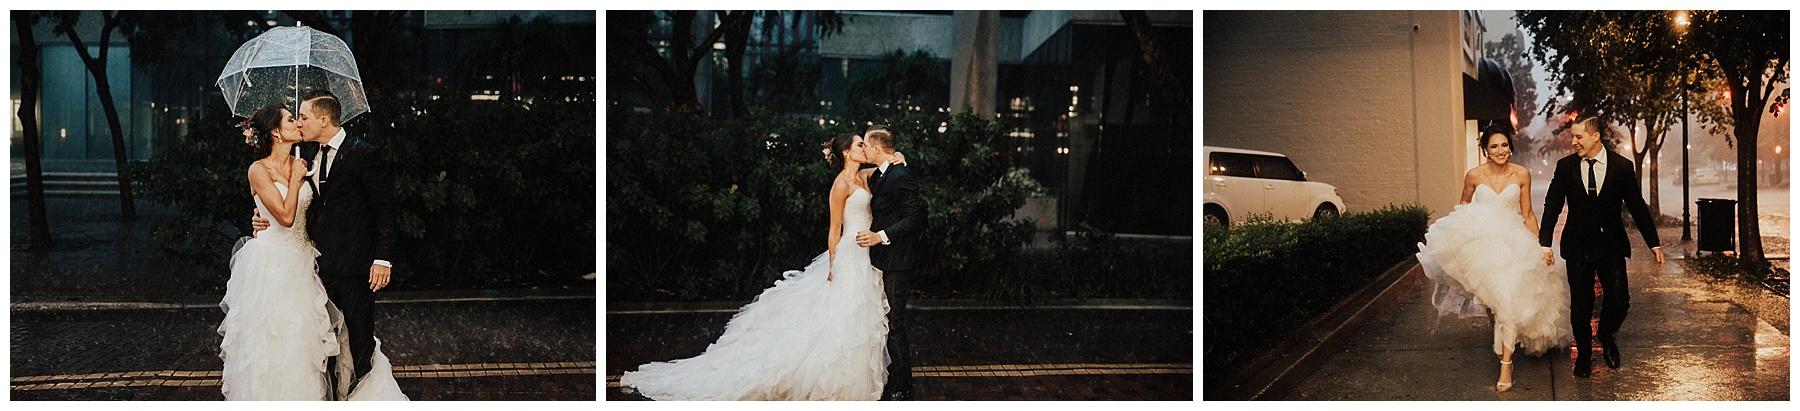 YBOR Wedding Tampa Wedding Photographer-131.jpg